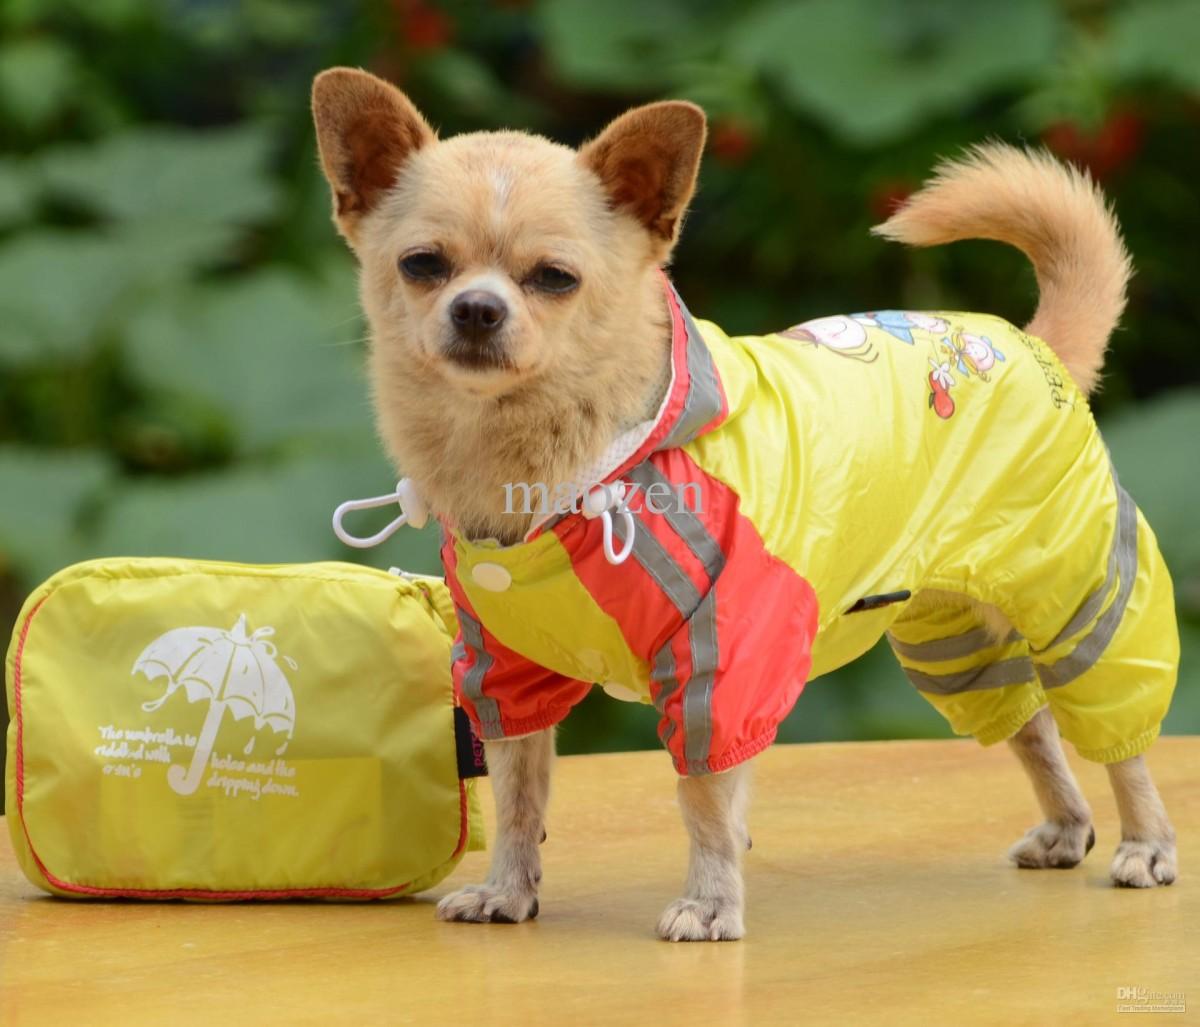 Dog Raincoat (Image: dhgate.com)